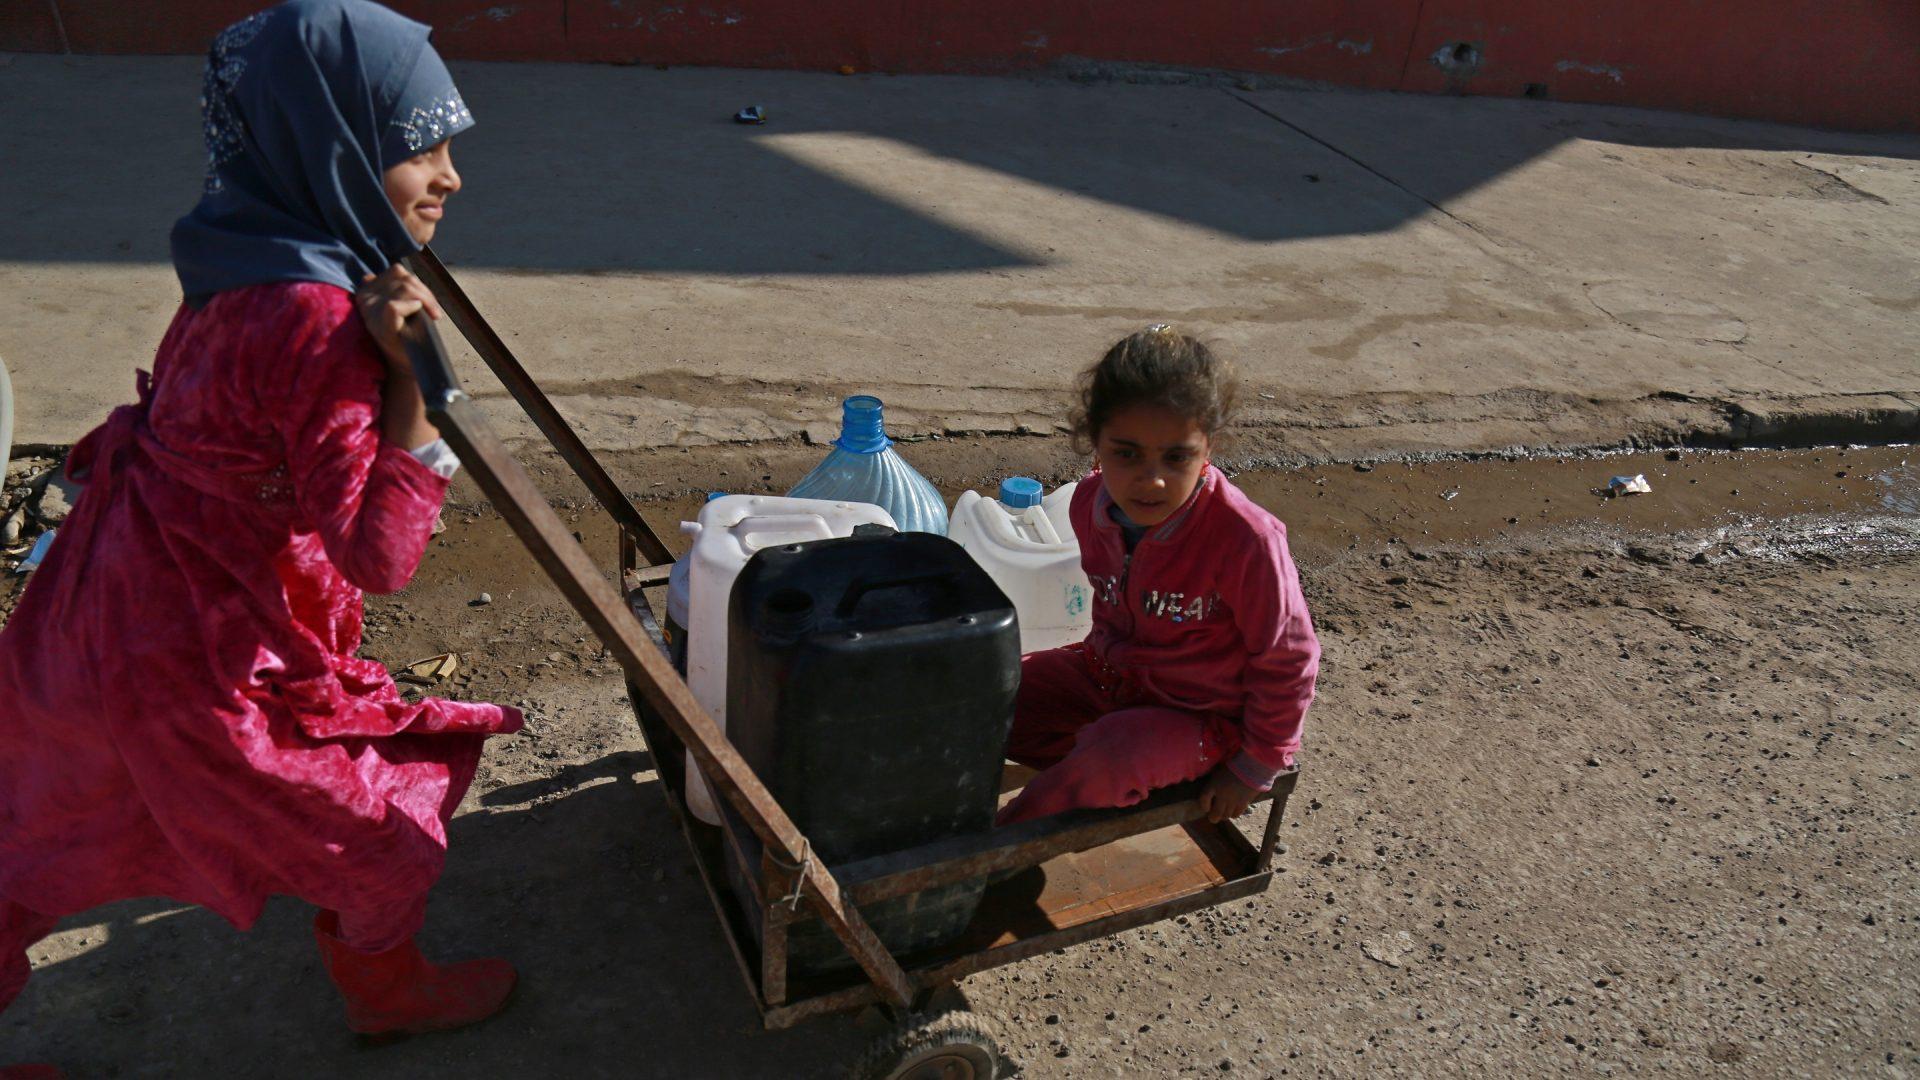 Irak, East Mosul 2017, foto Michal Przedlacki